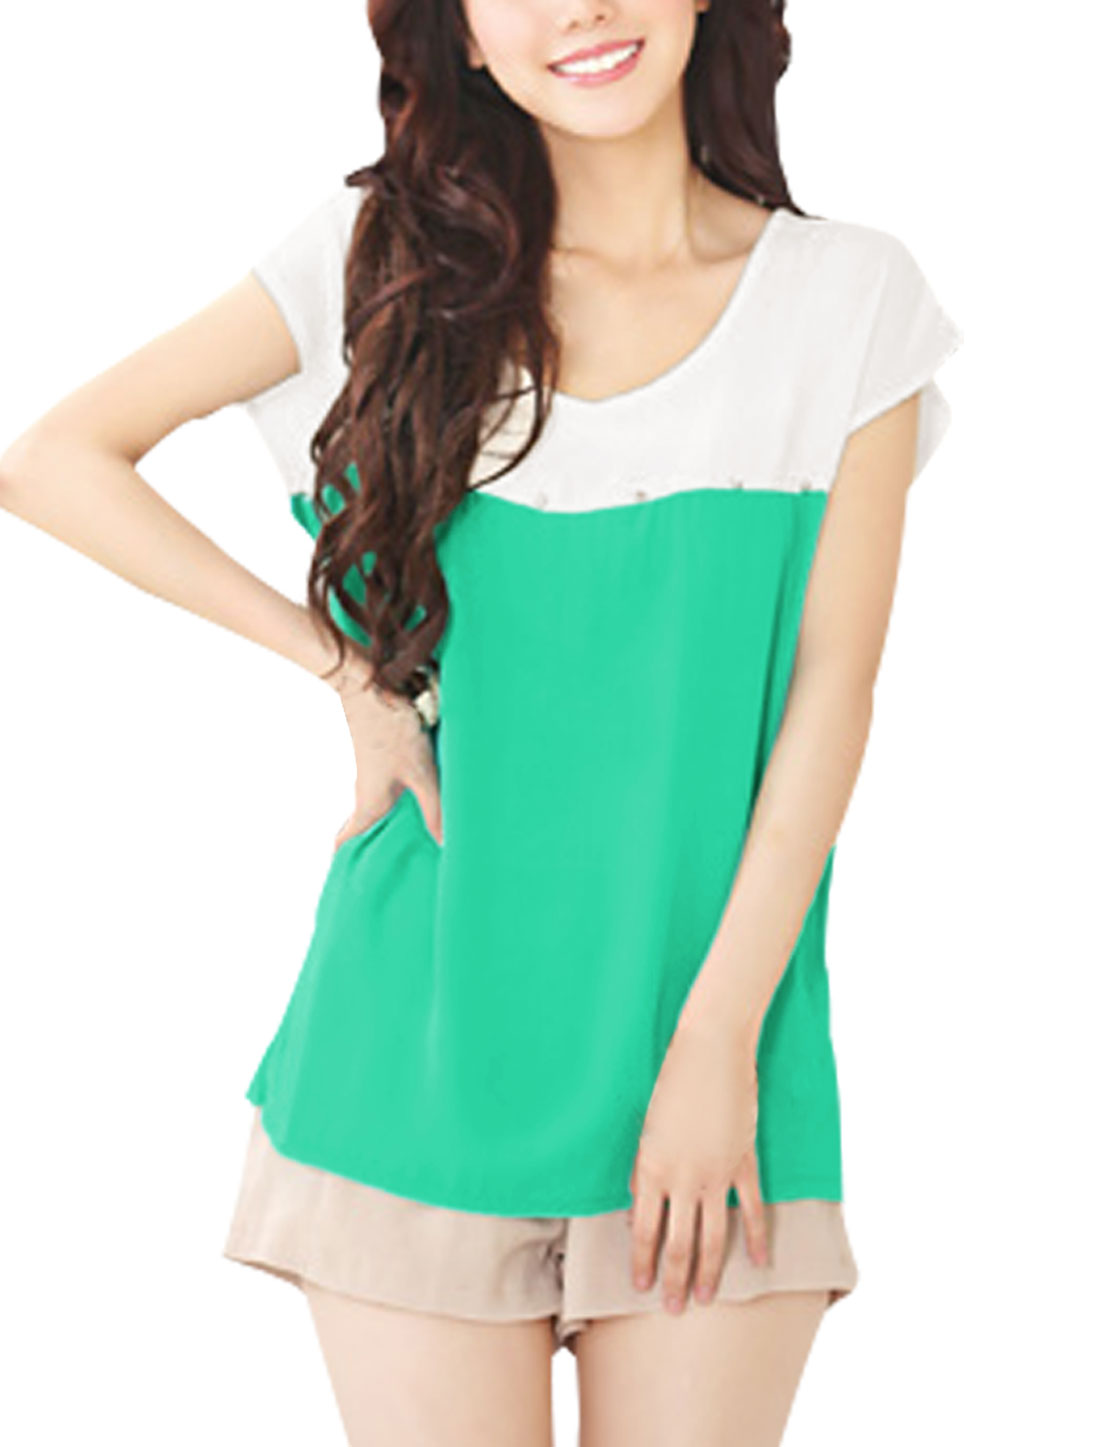 Ladies Round Neck Short Dolman Sleeve Light Green White Blouse XS